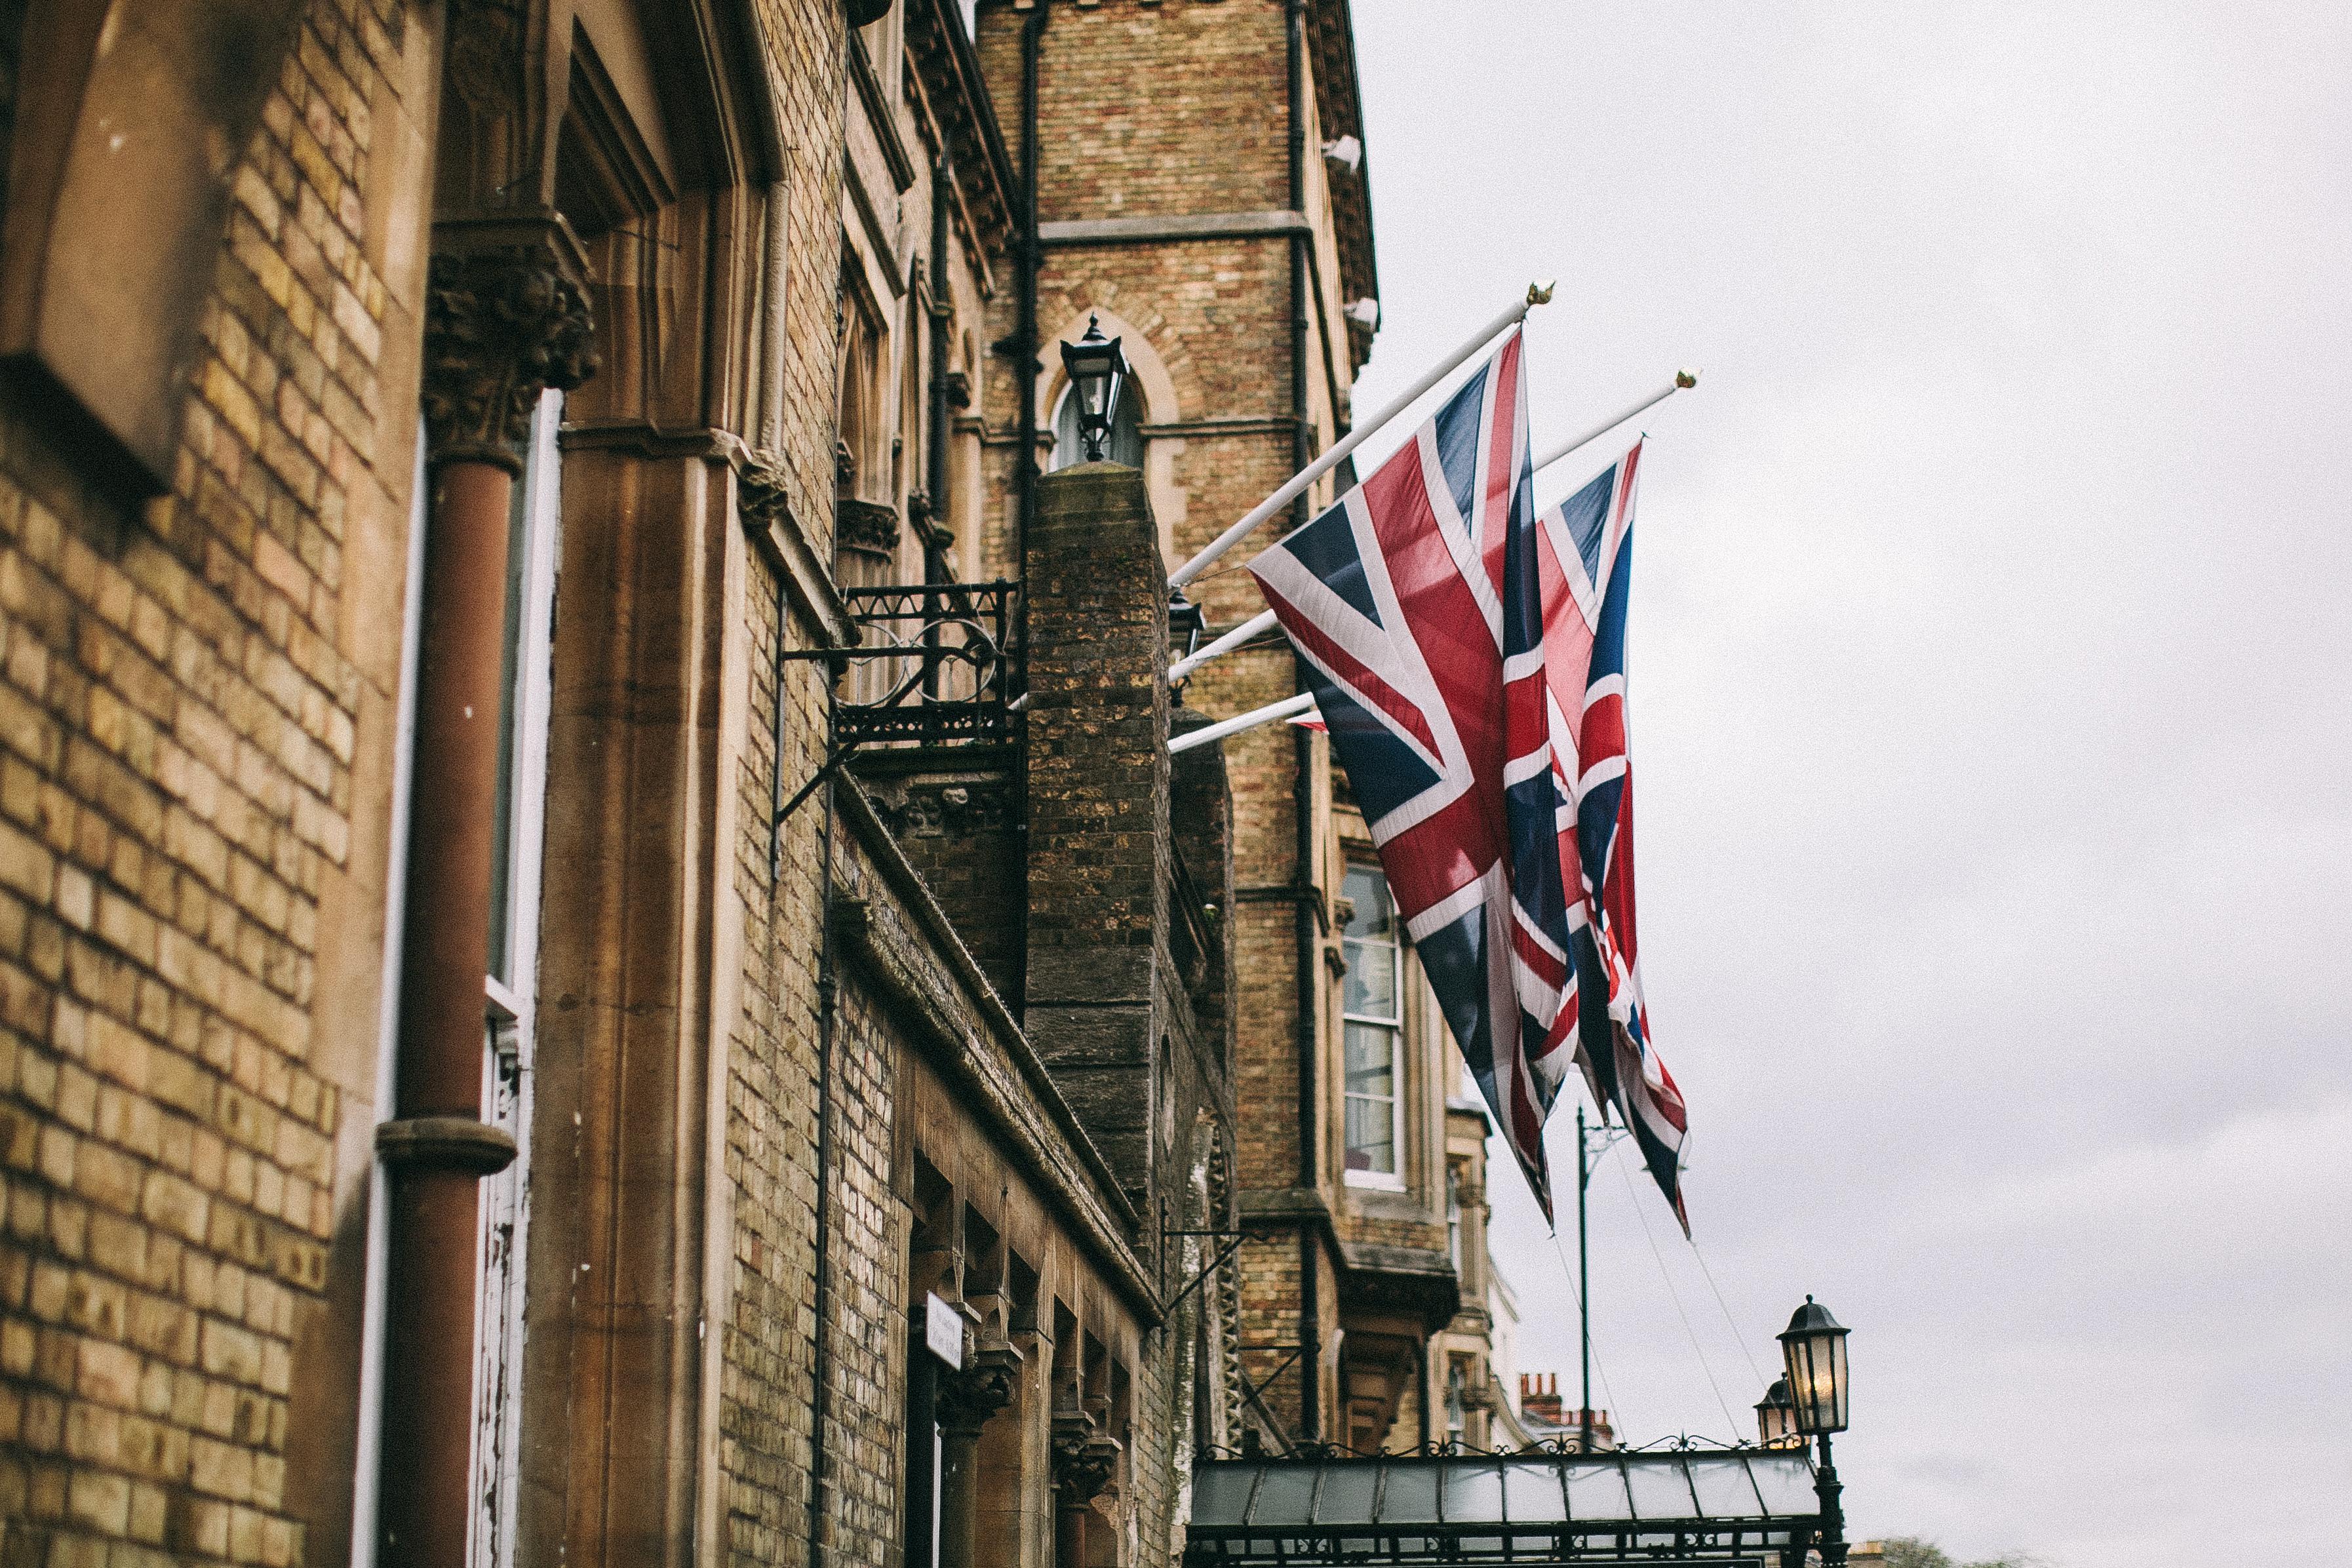 anglické vlajky